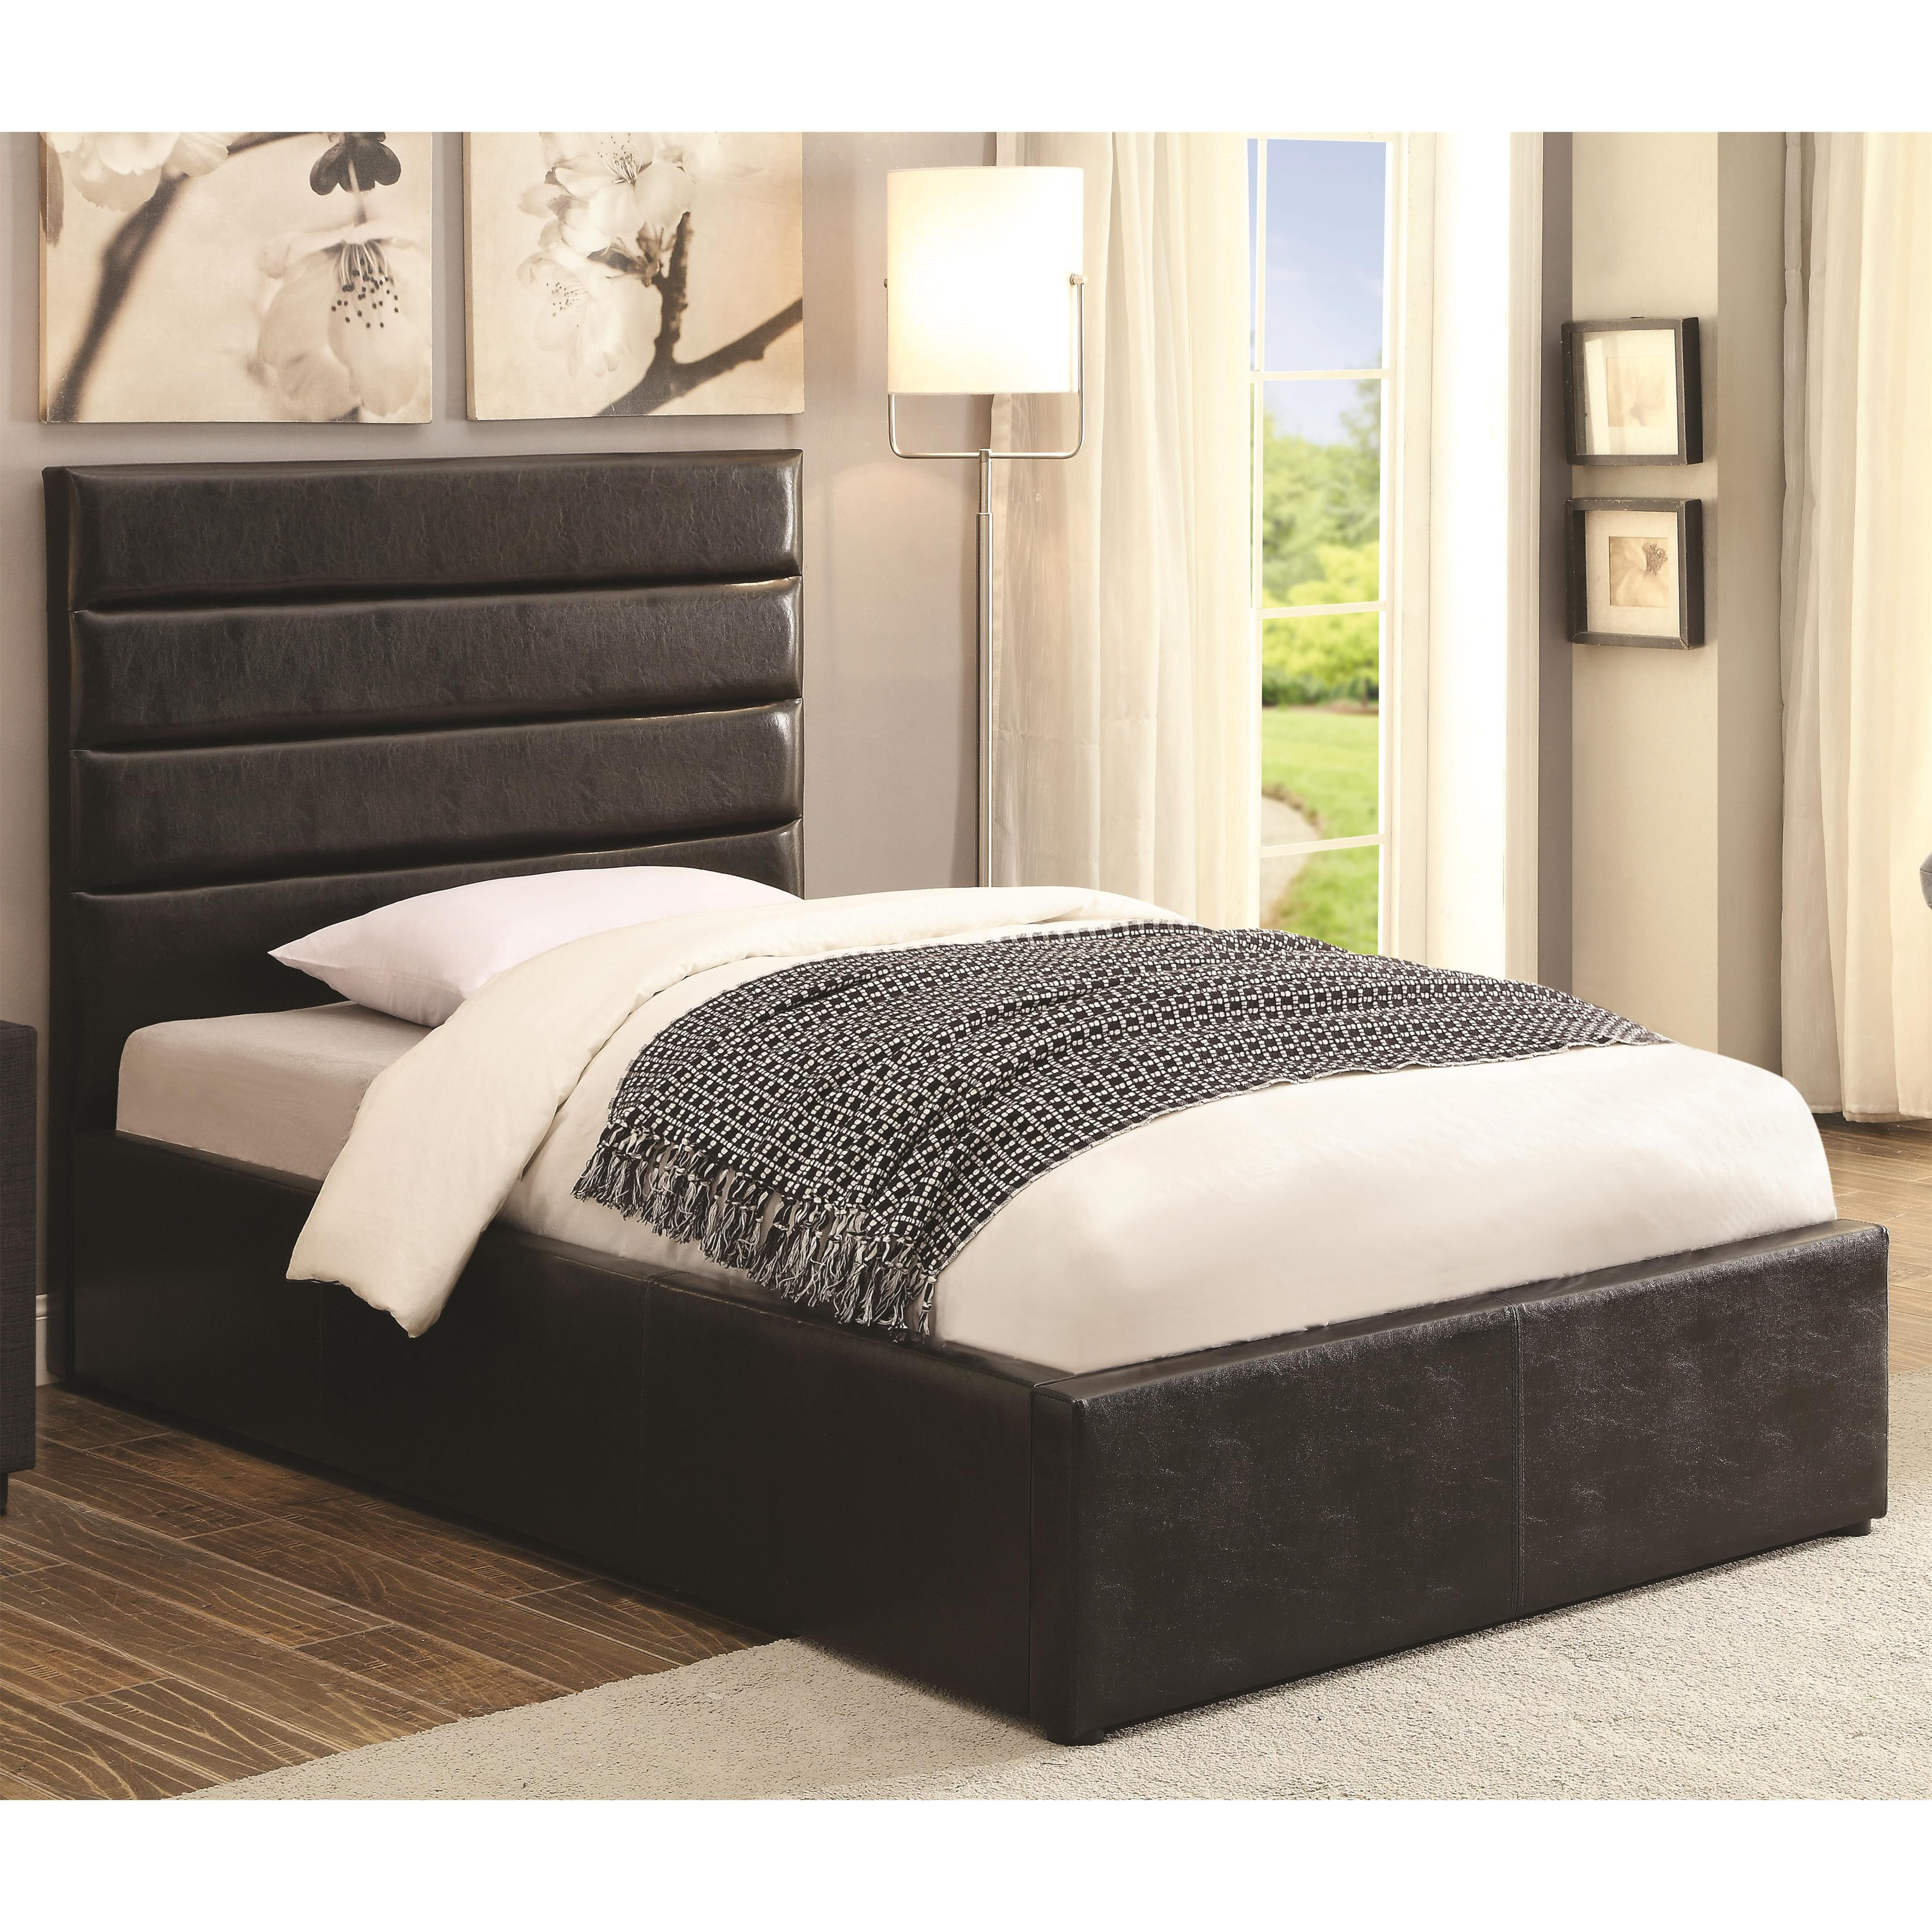 Coaster Riverbend F Full Bed